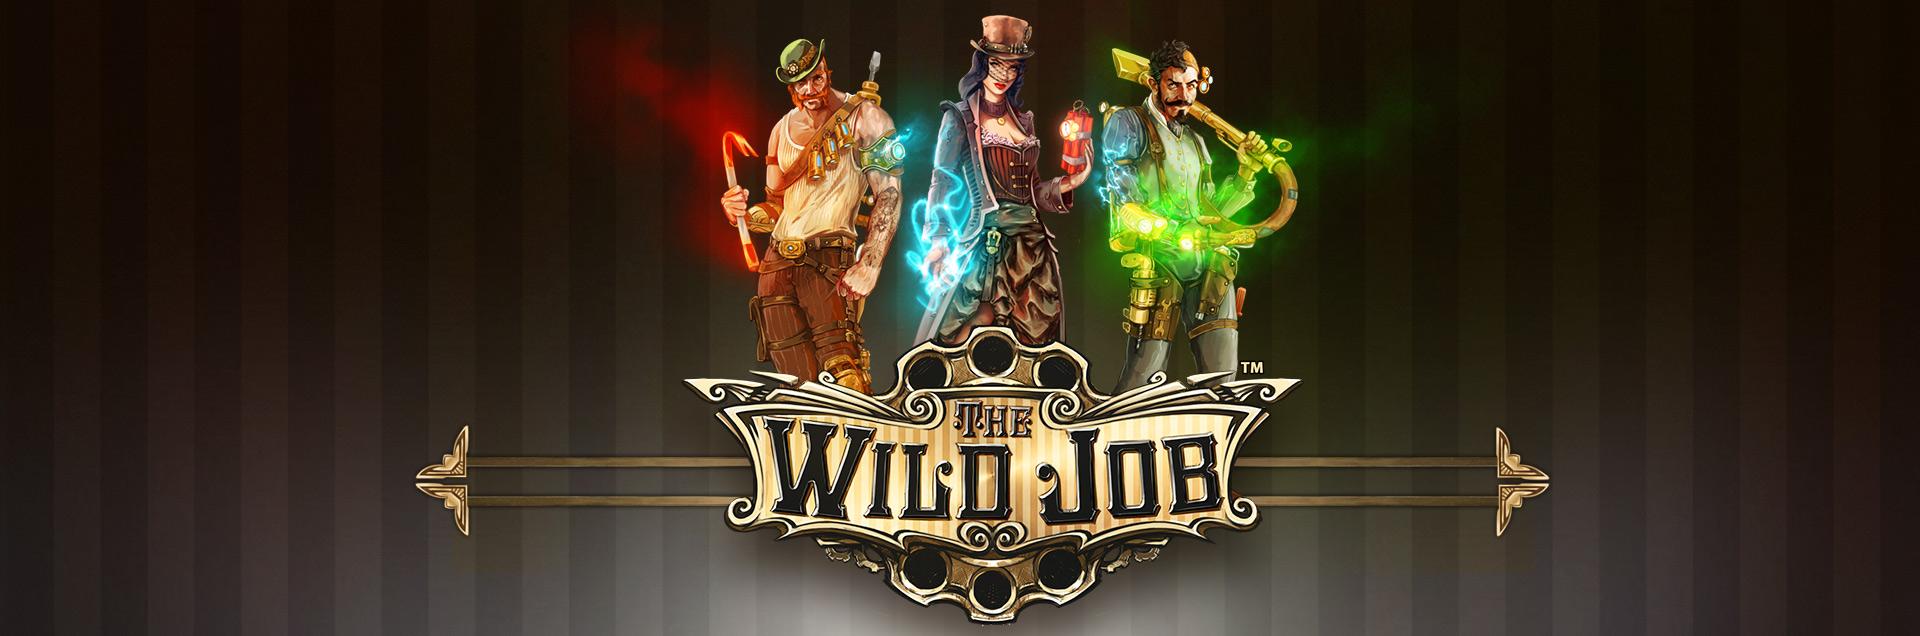 WildJob logo